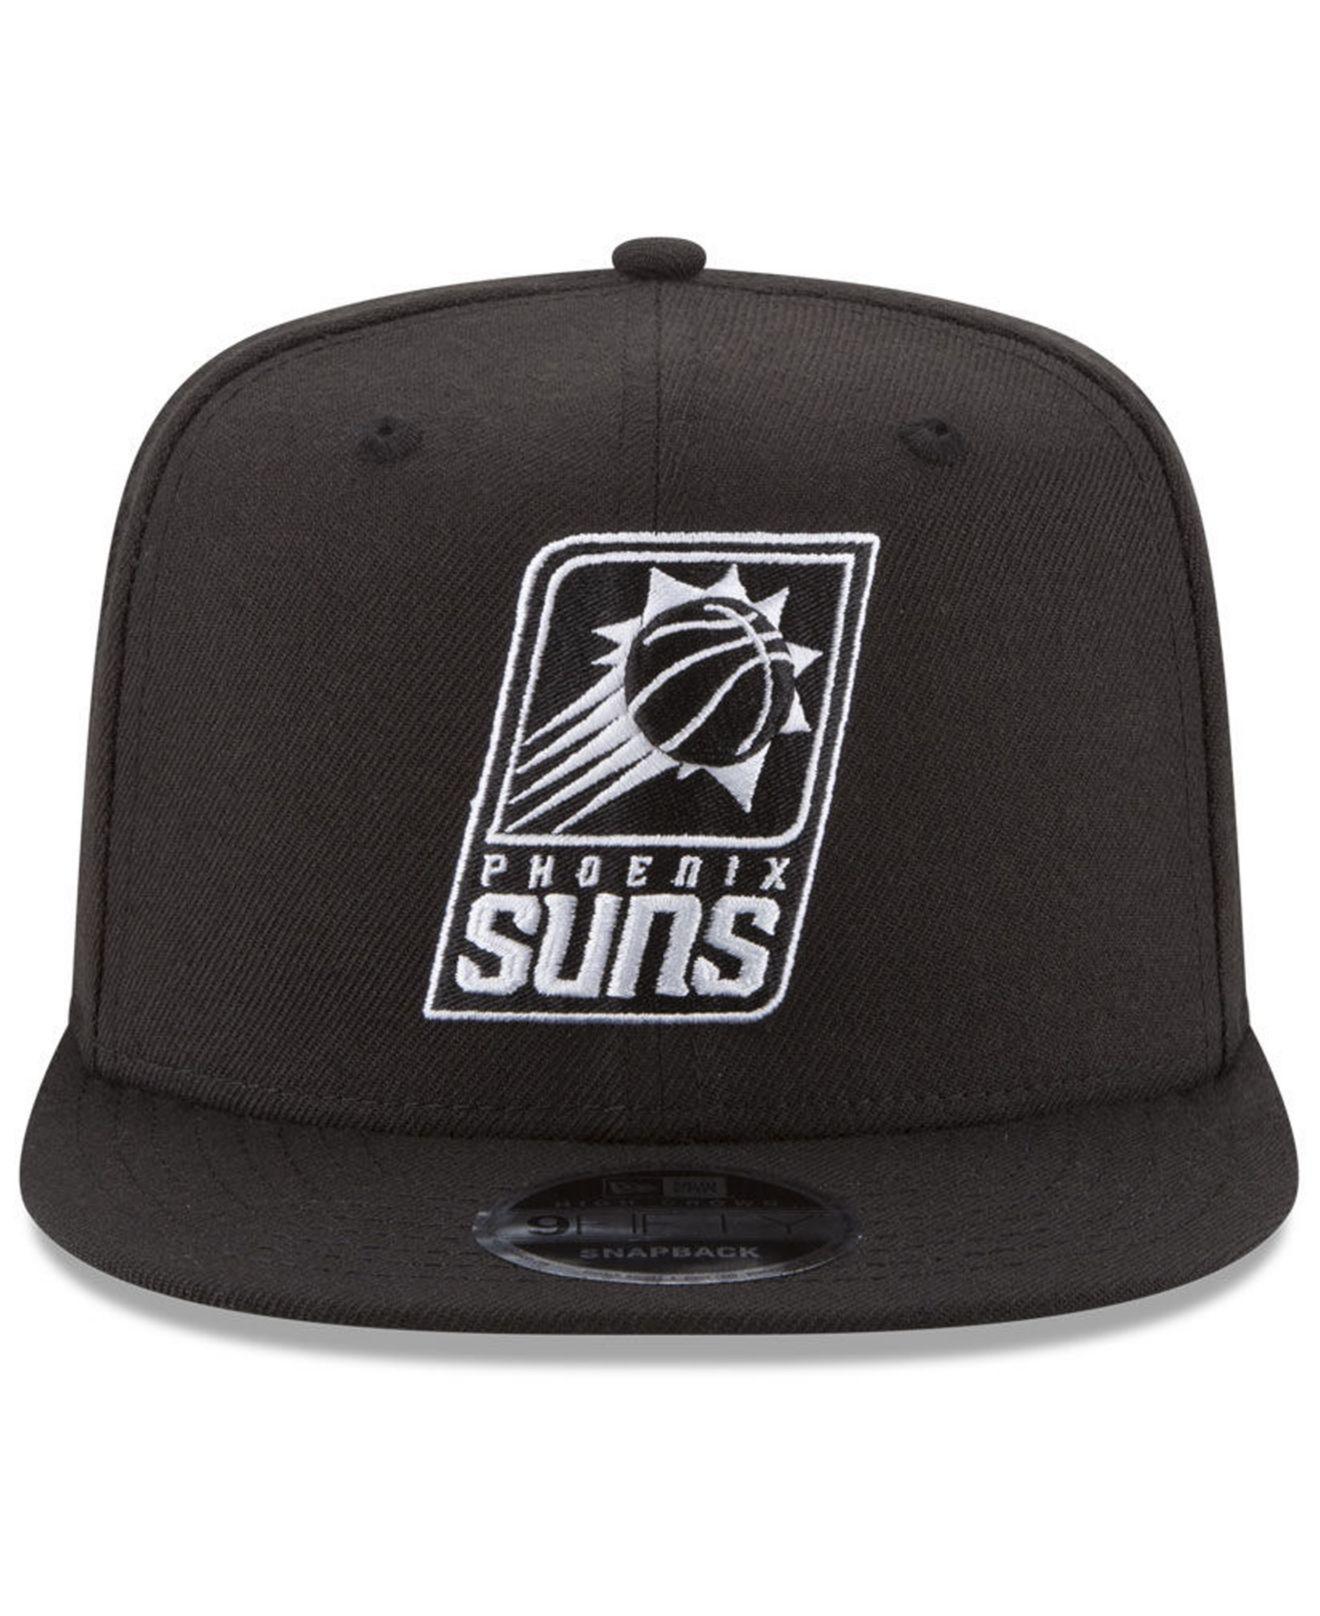 size 40 48609 d2d00 ... australia lyst ktz phoenix suns anniversary patch 9fifty snapback cap  in black for men 09b89 2905d